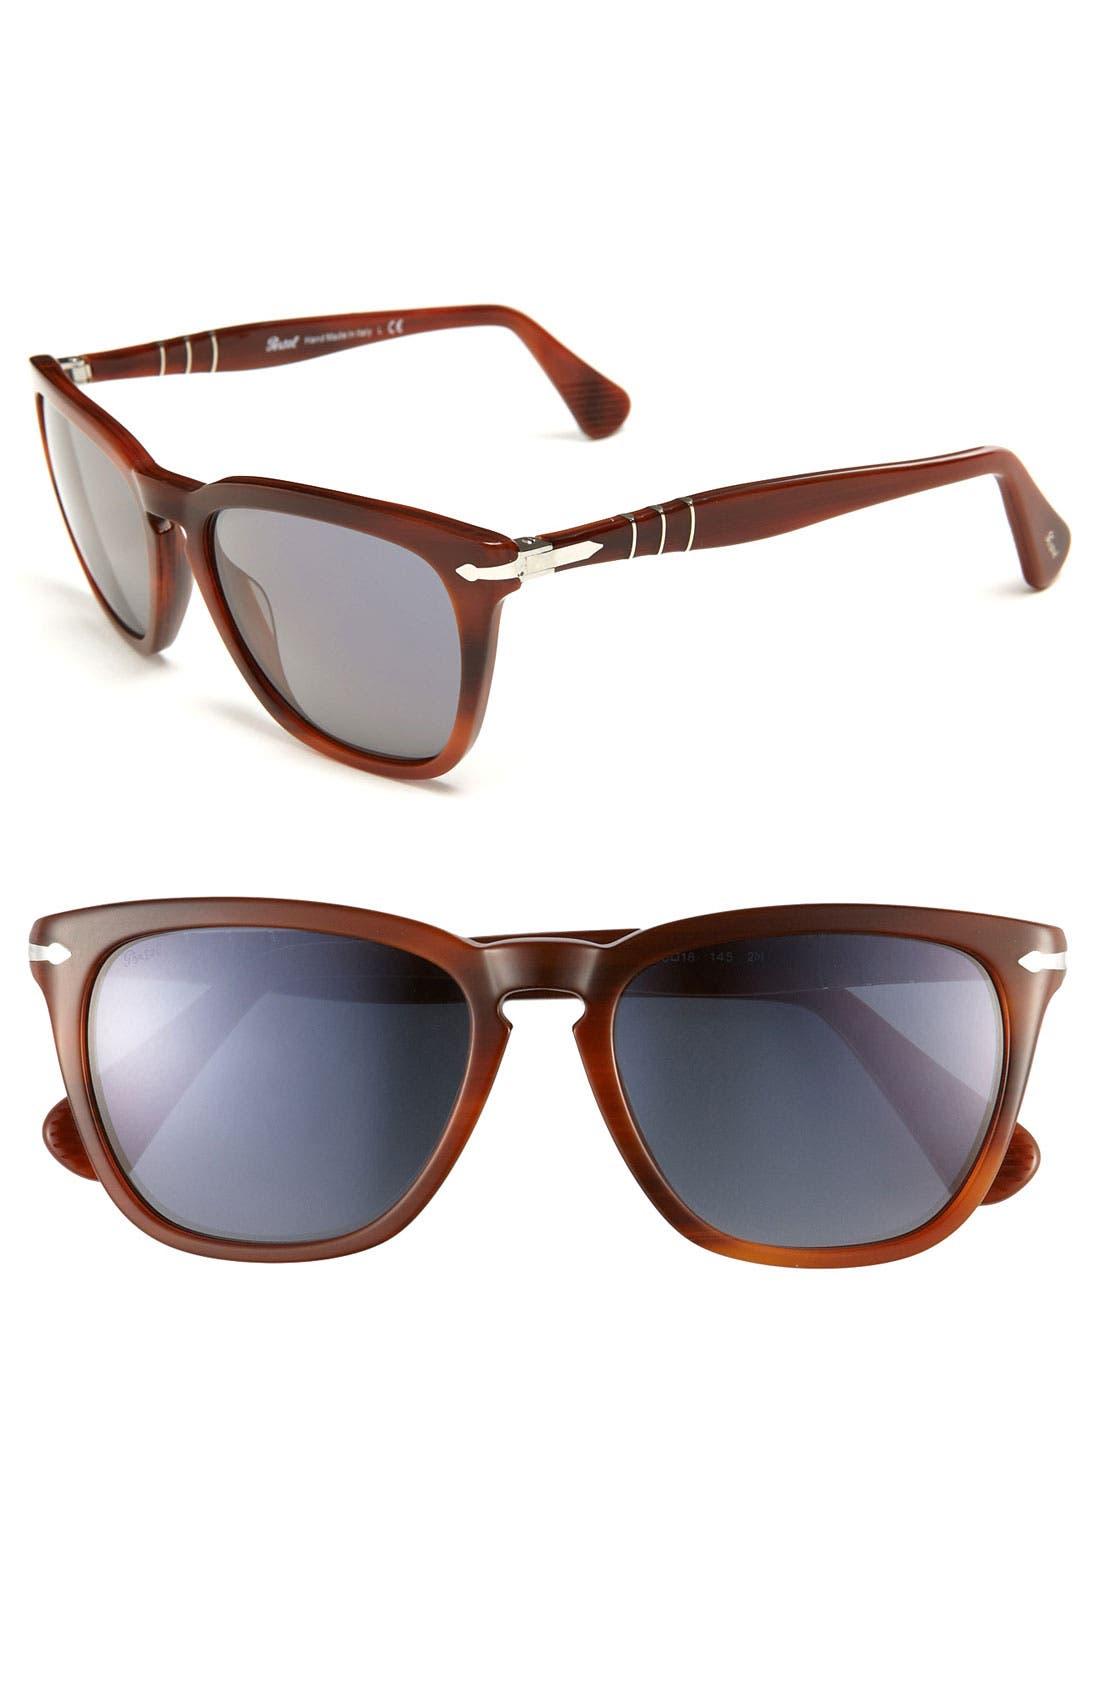 Main Image - Persol 'Capri' 55mm Sunglasses